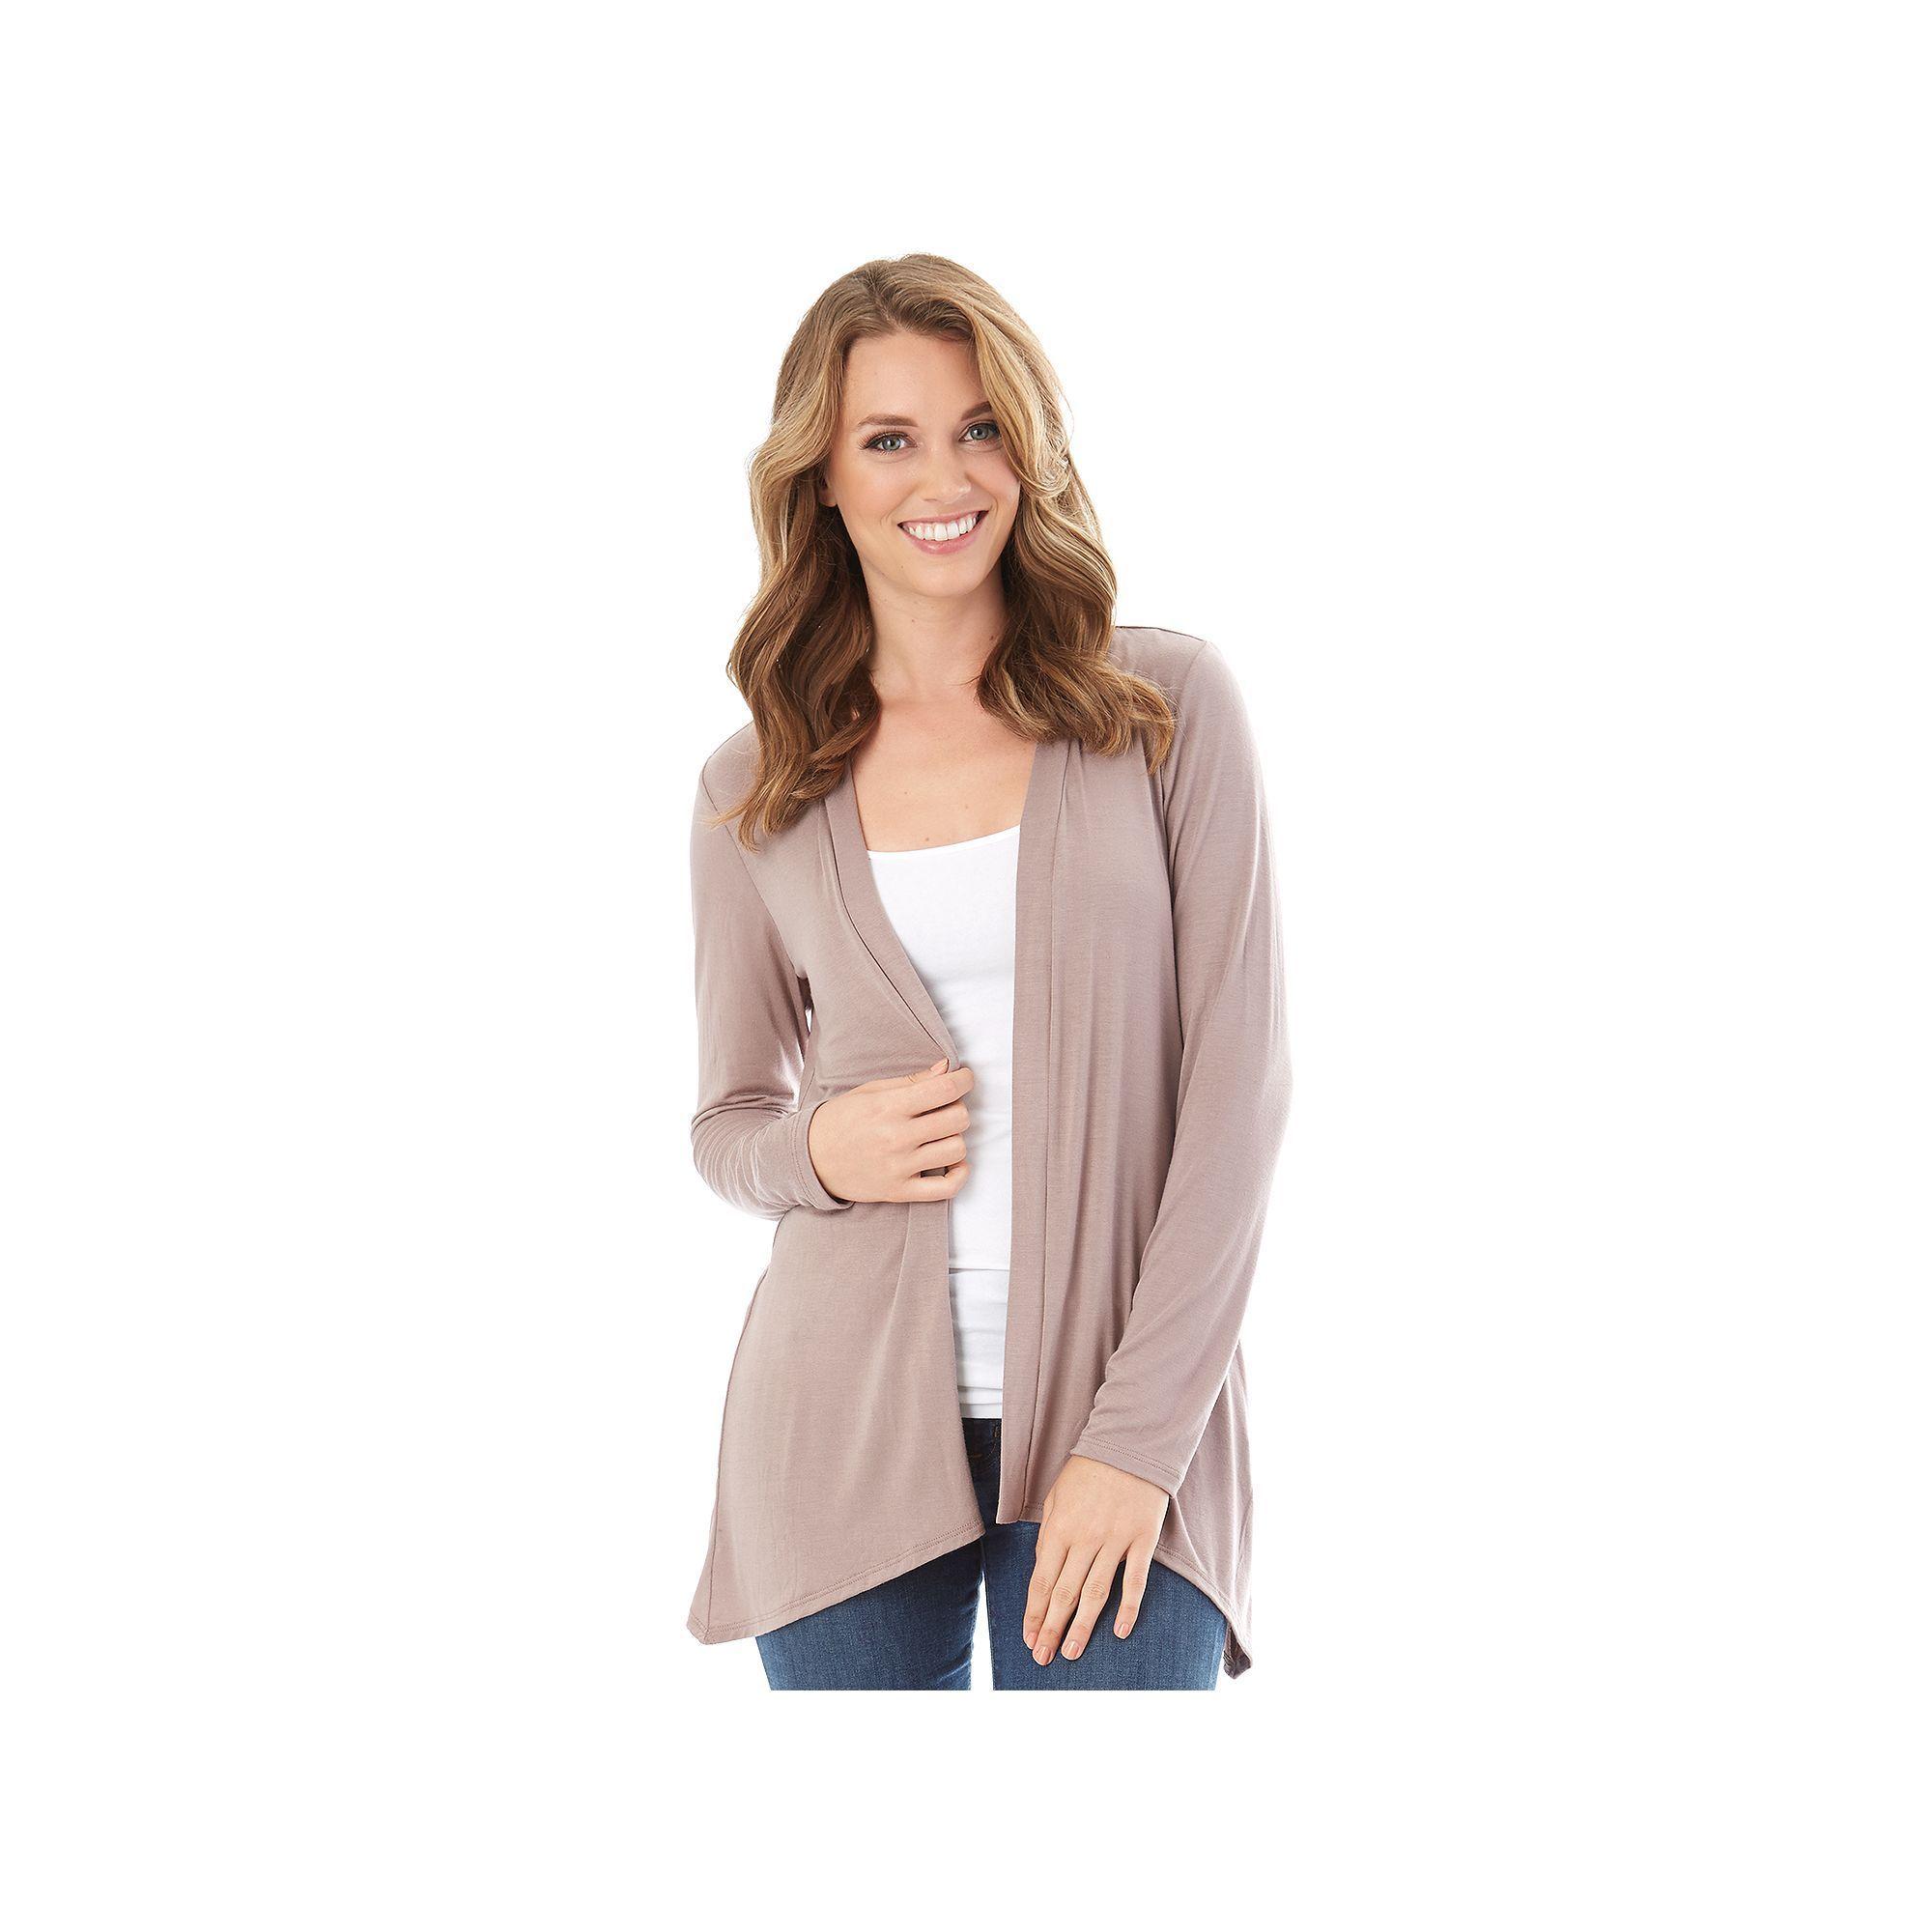 Women's Apt. 9 Lace Back Cozy Cardigan, Beige Oth | Cardigans For ...